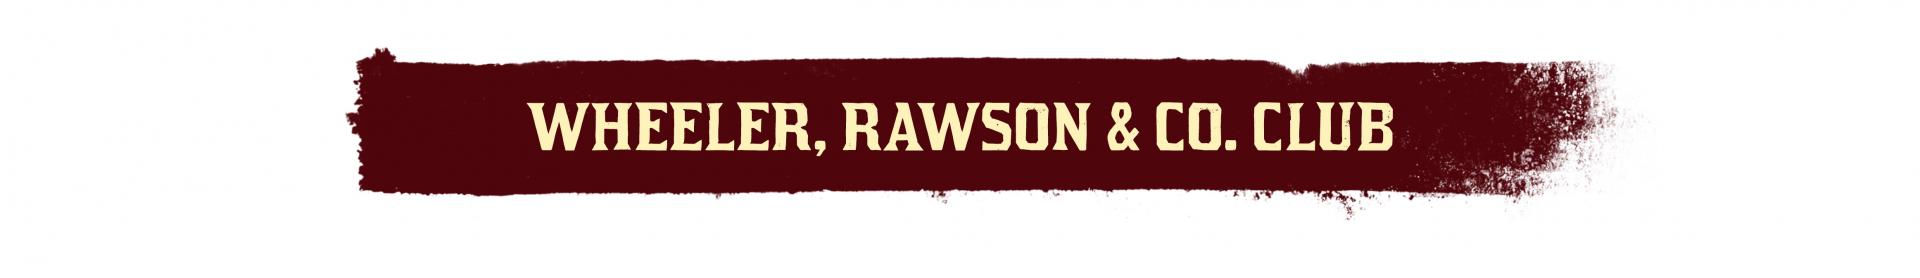 Red Dead Online Club Wheeler, Rawson & Co.